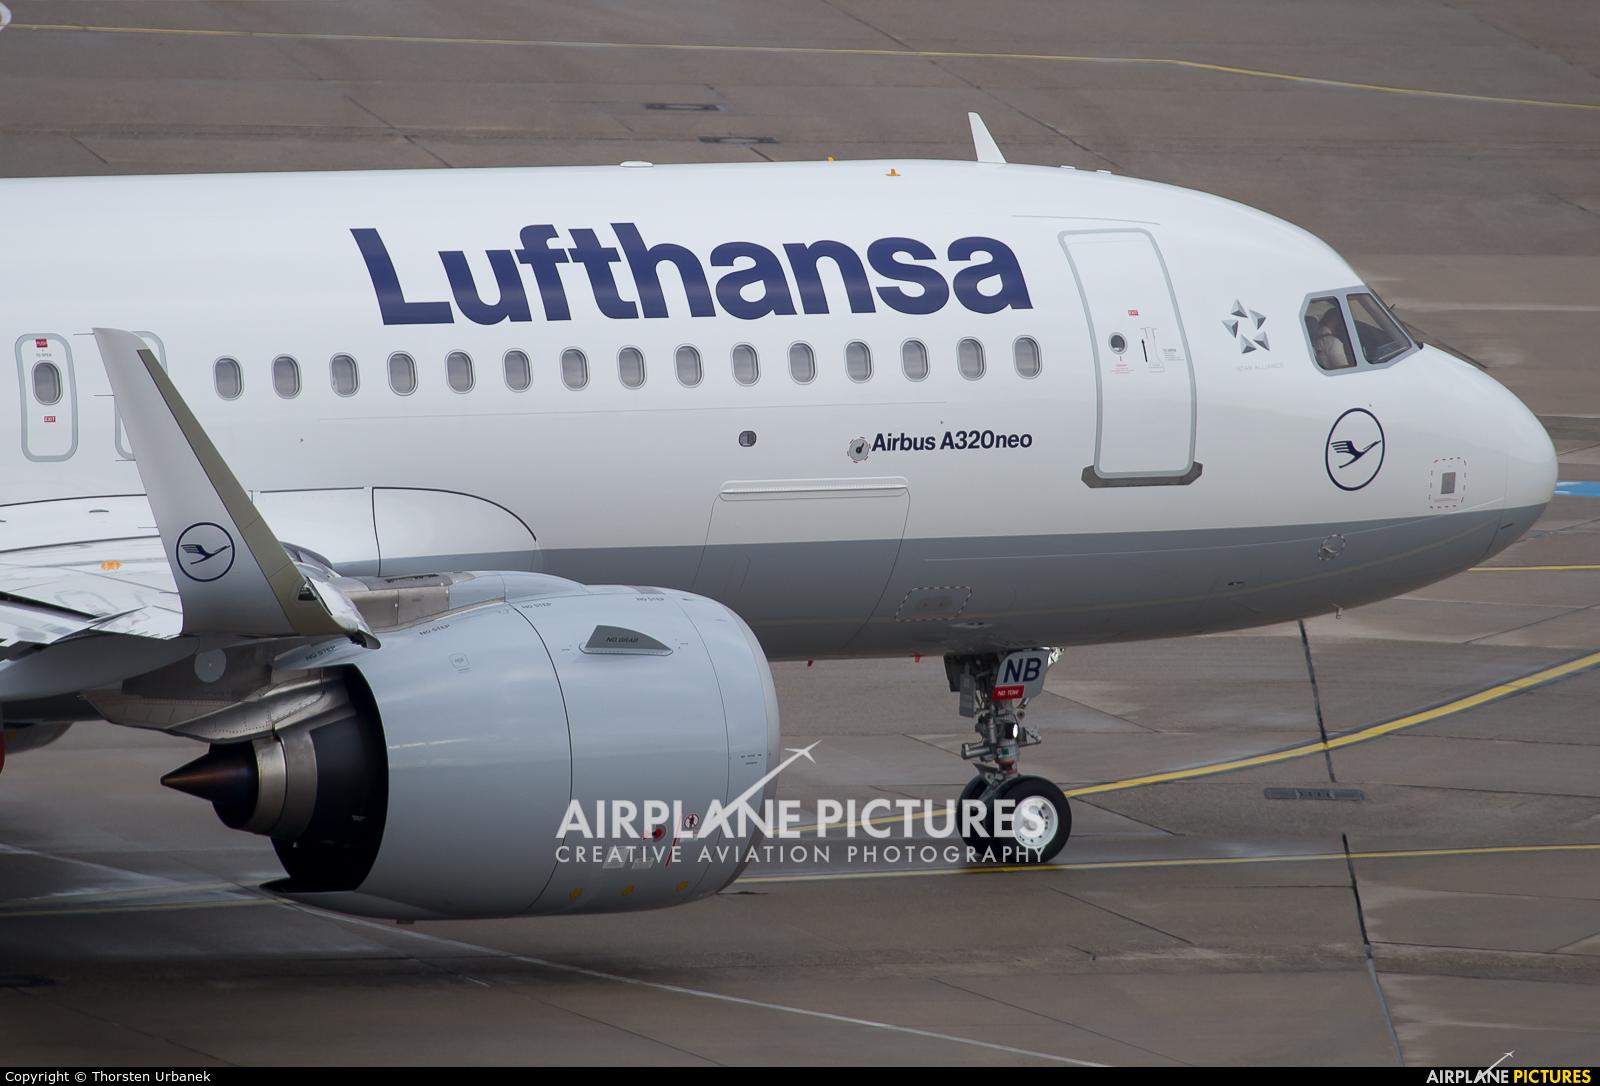 Lufthansa D-AINB aircraft at Düsseldorf